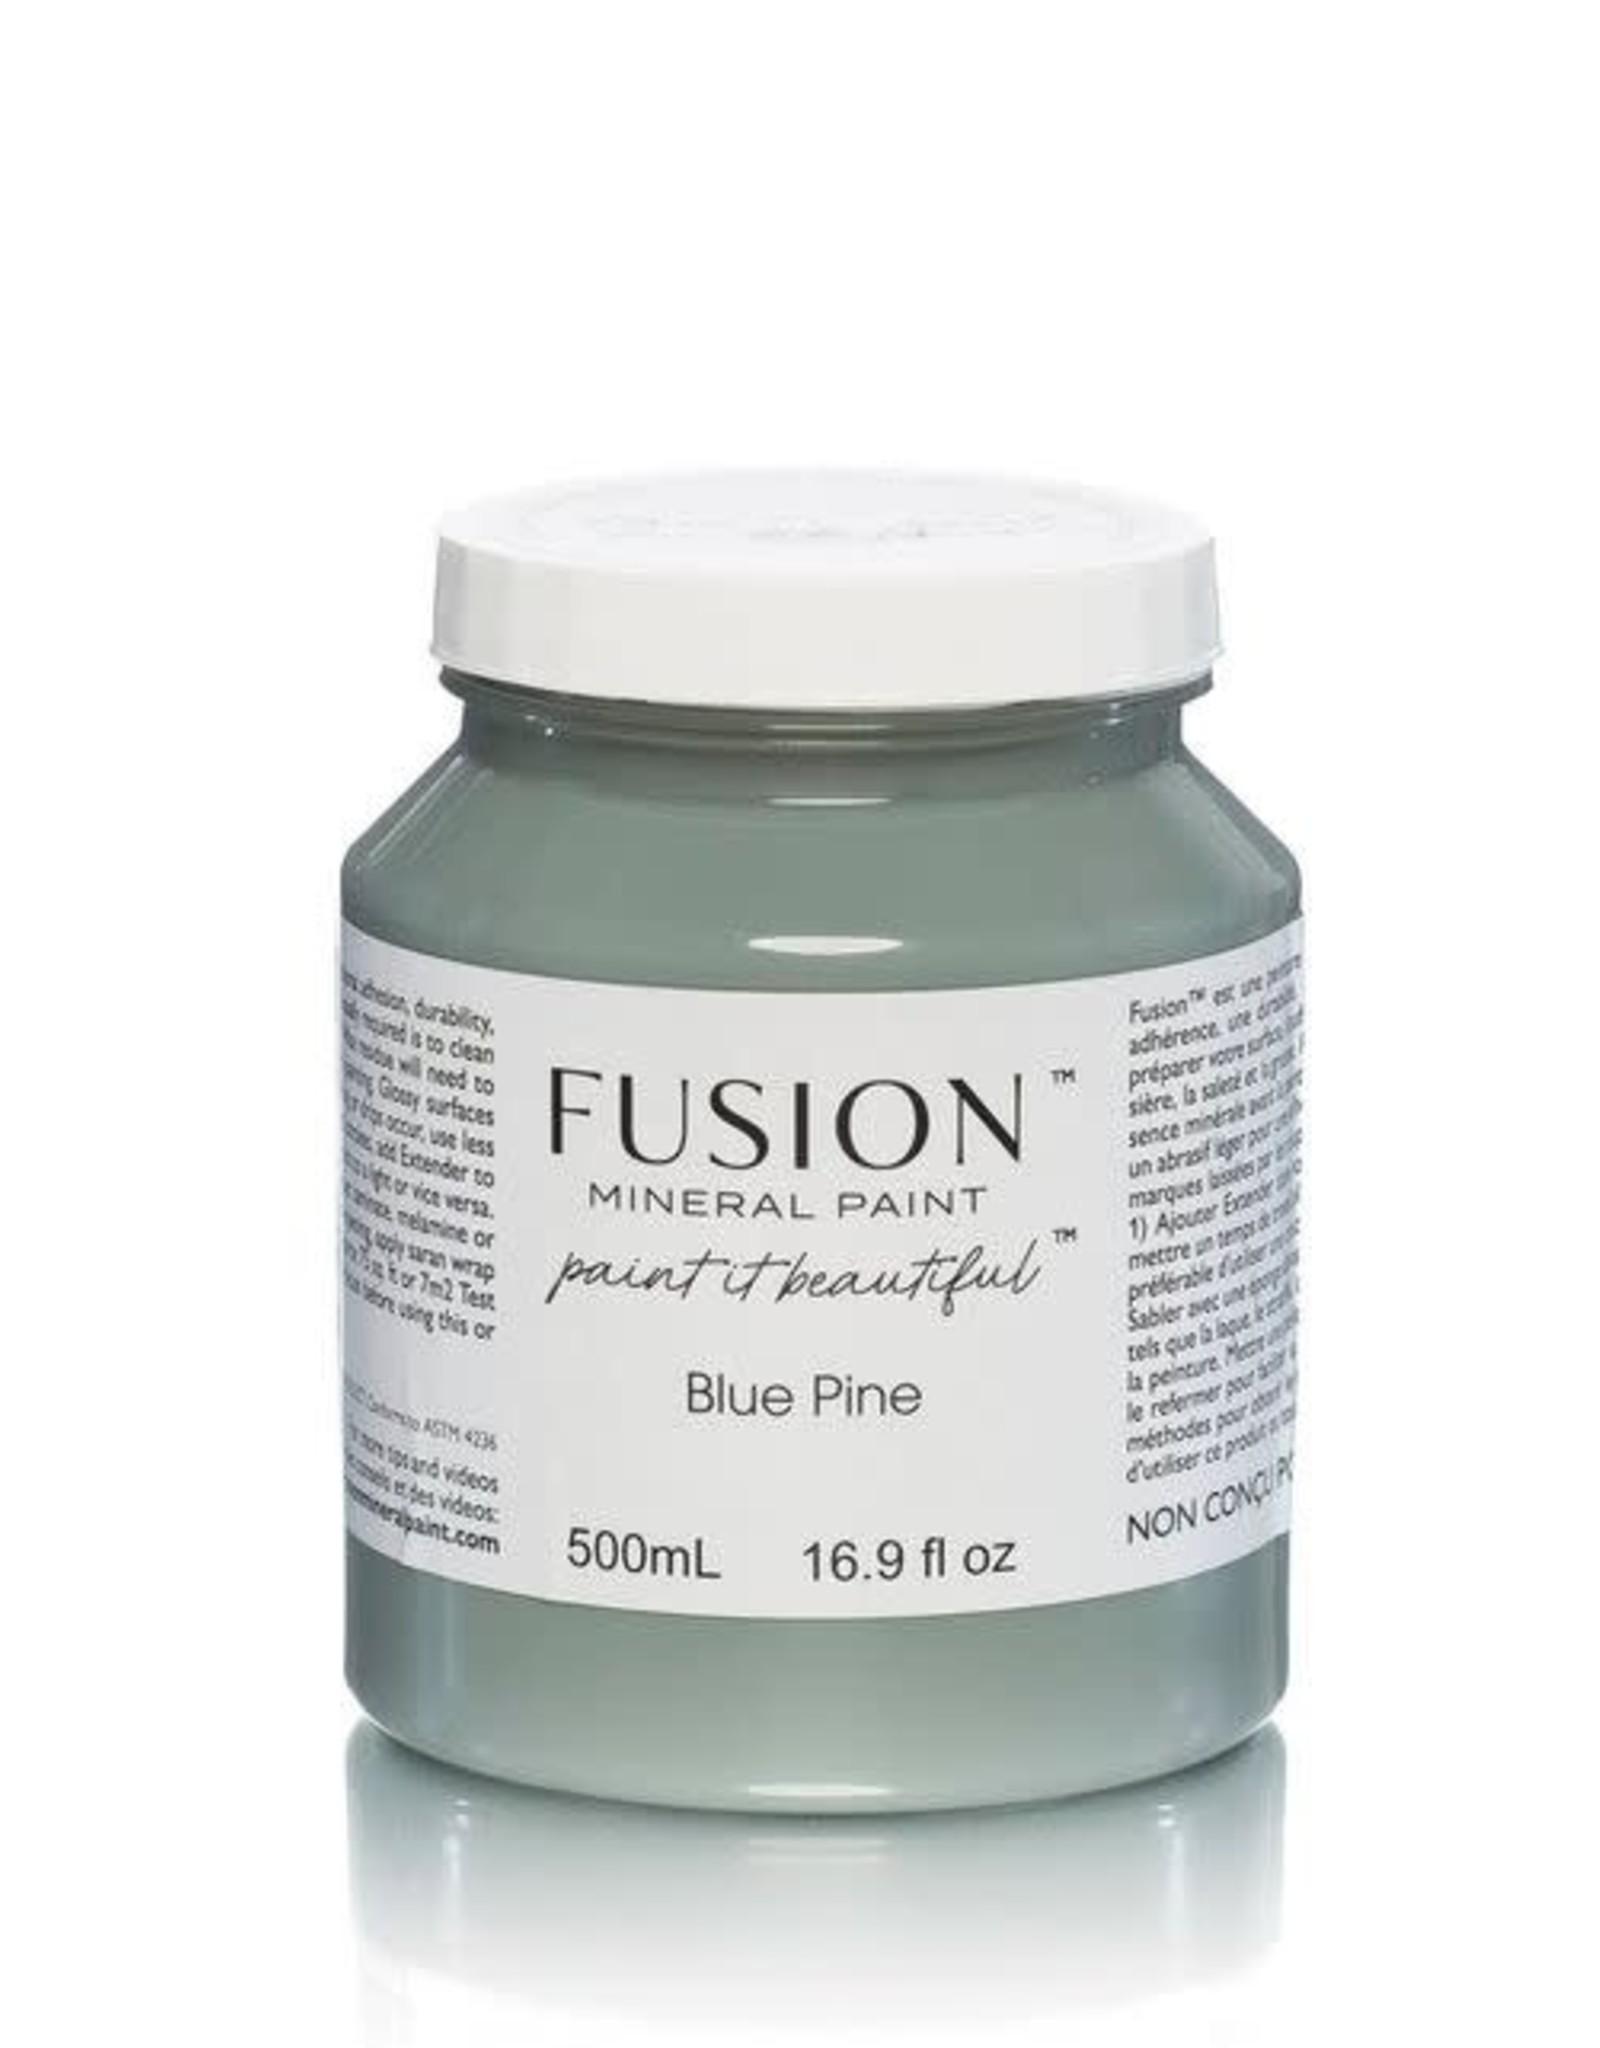 Fusion Mineral Paint Fusion Mineral Paint - Blue Pine 500ml